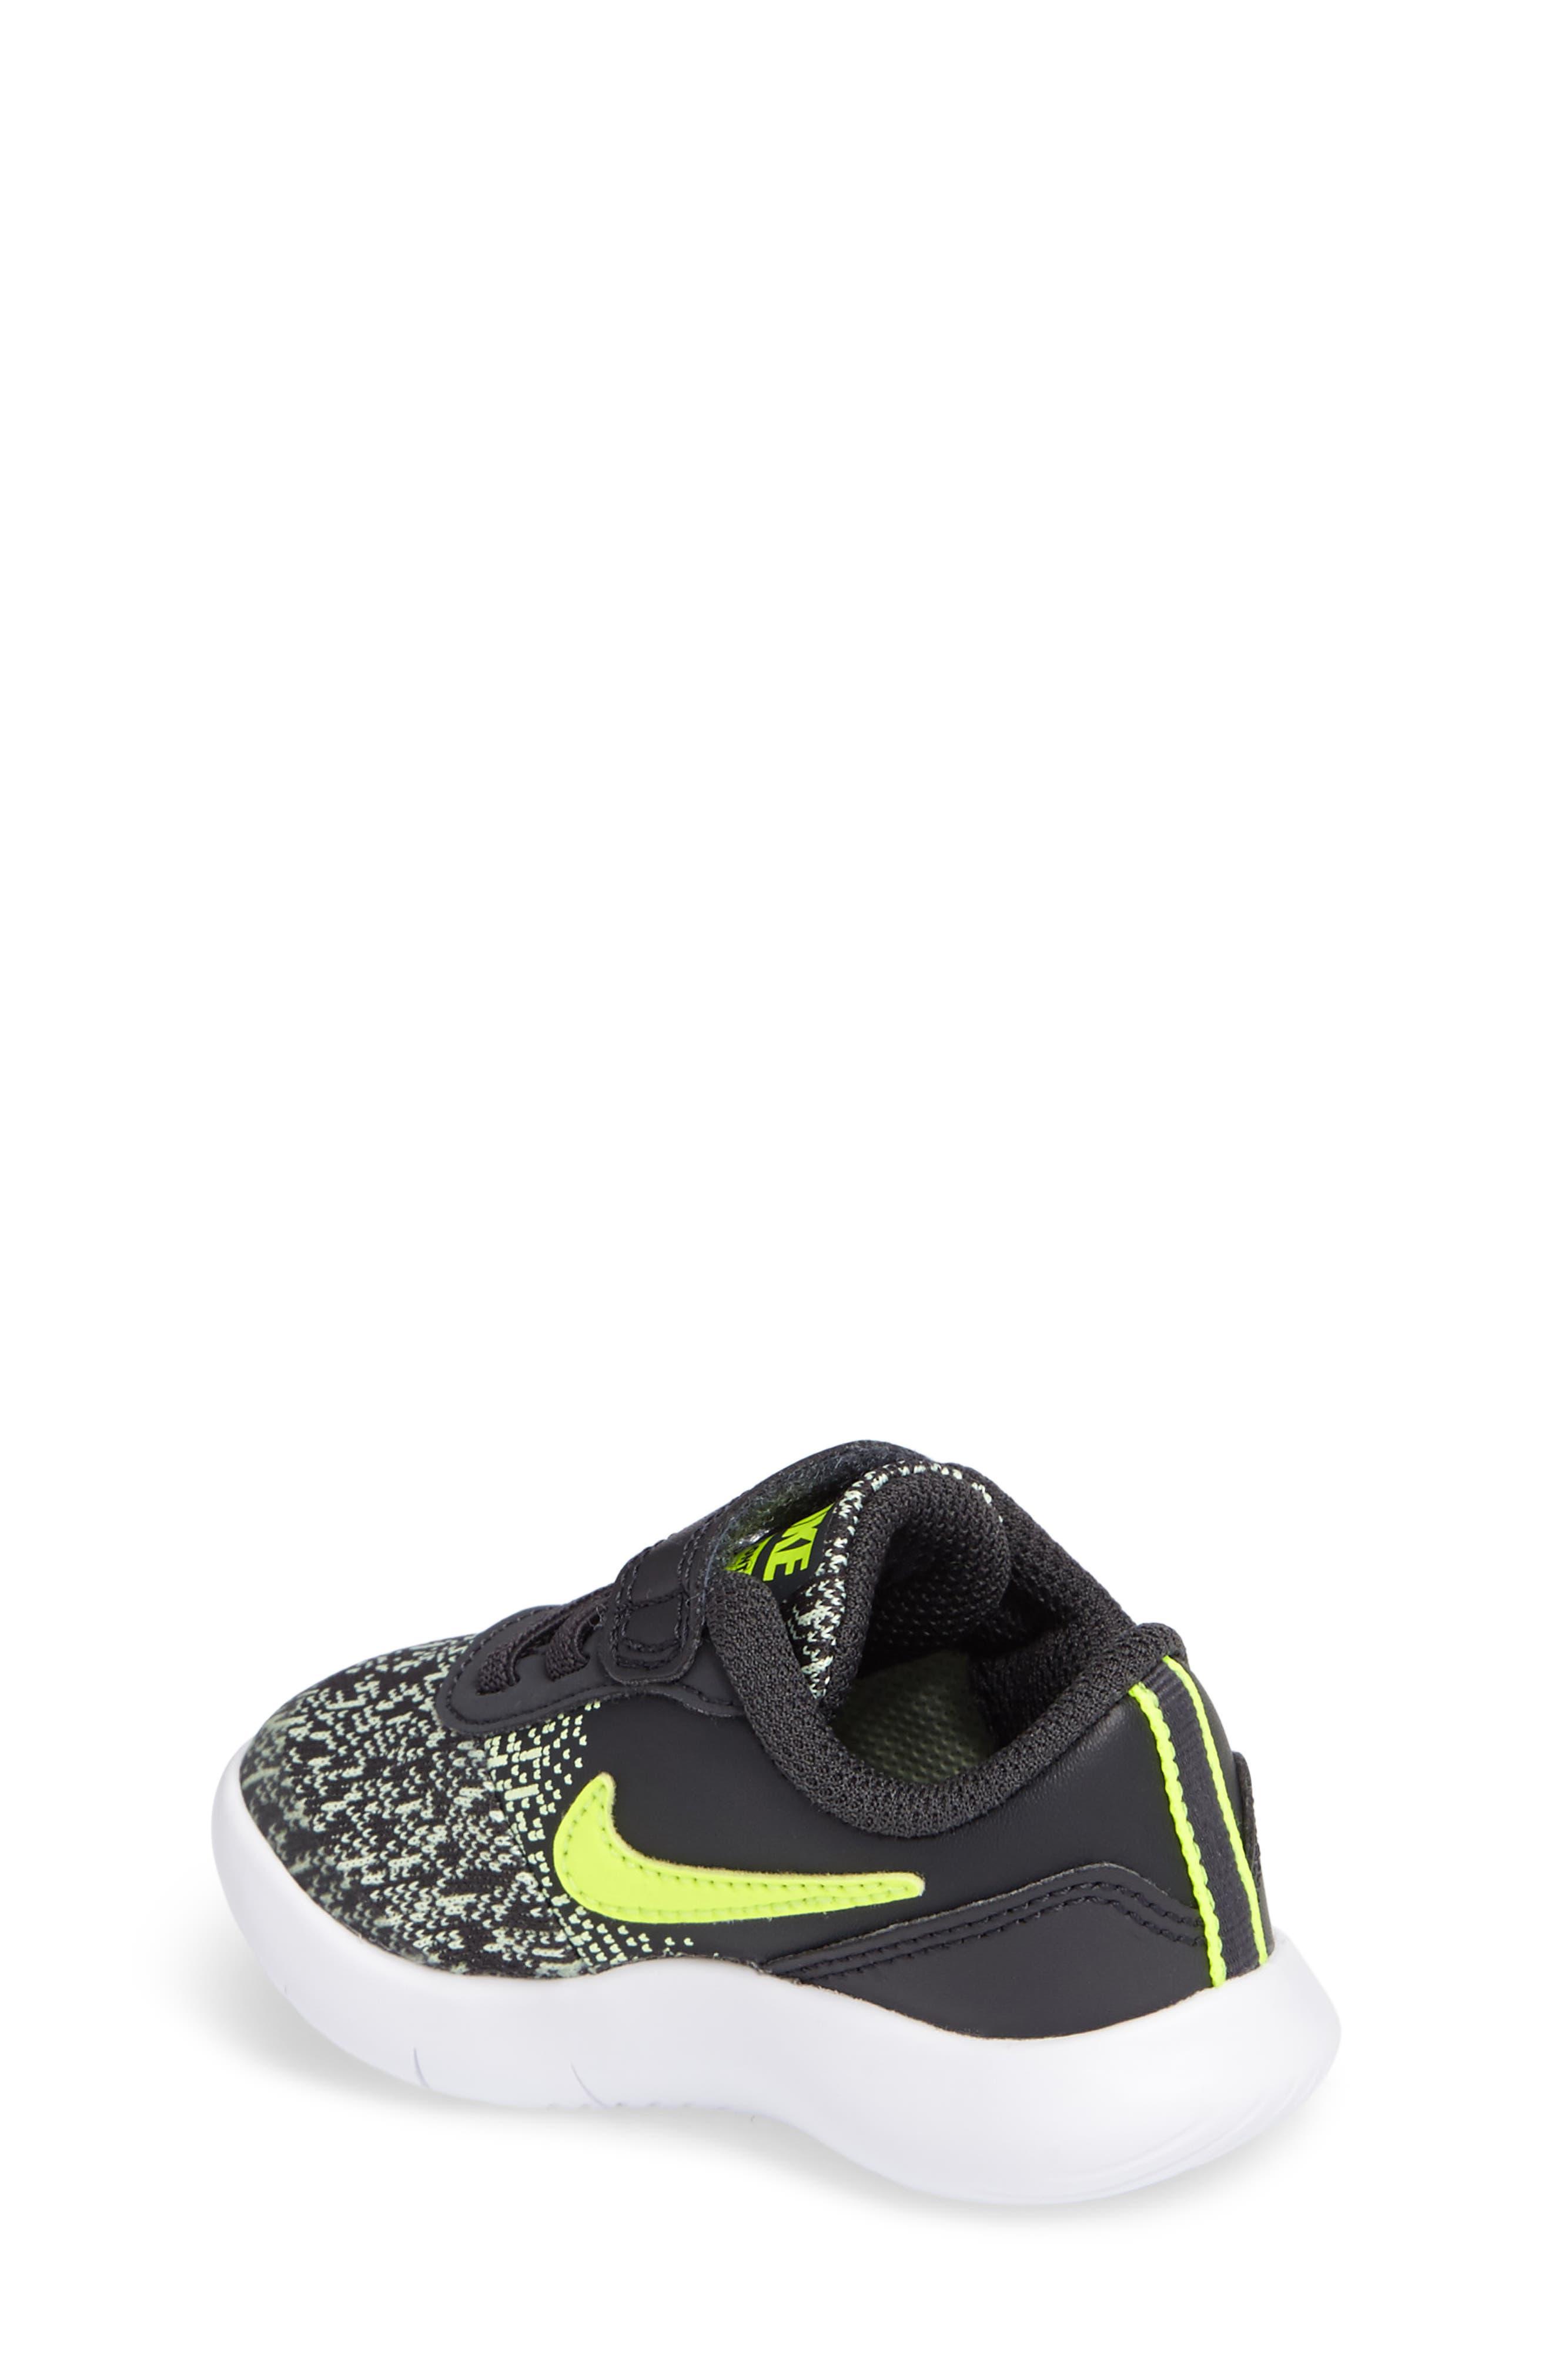 Flex Contact Sneaker,                             Alternate thumbnail 3, color,